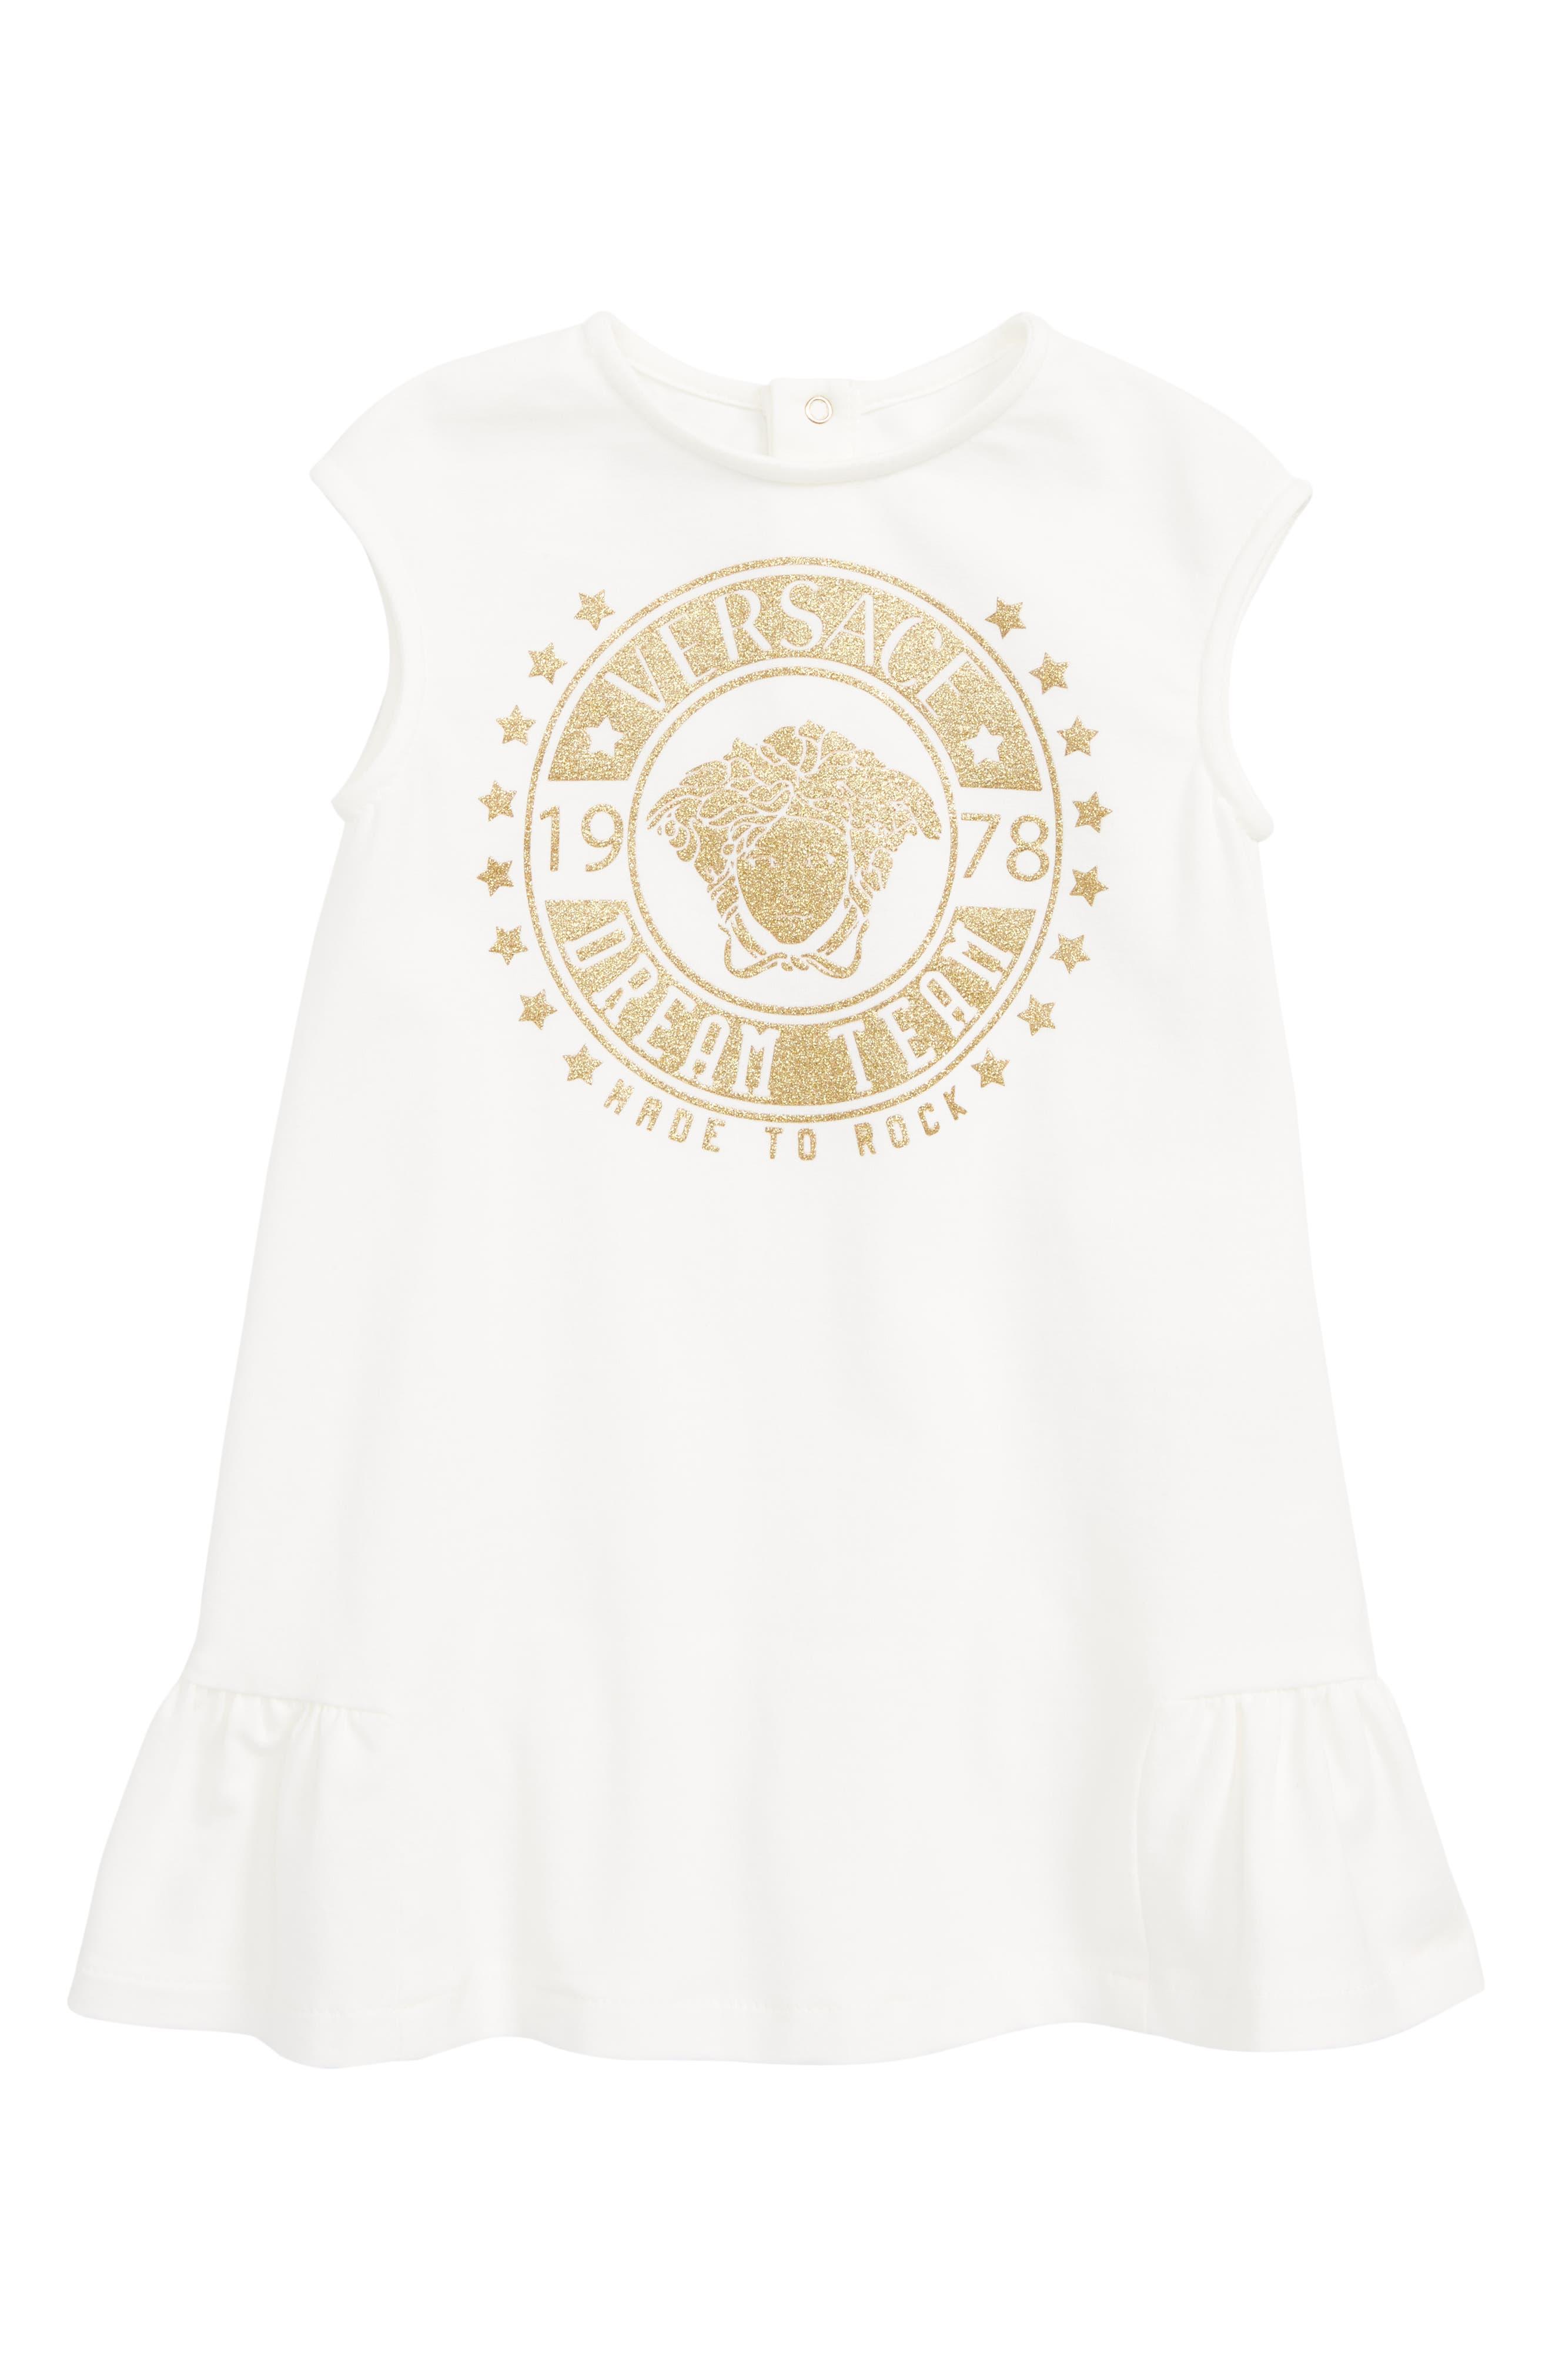 VERSACE, Logo Patch Sleeveless Dress, Main thumbnail 1, color, WHITE GOLD